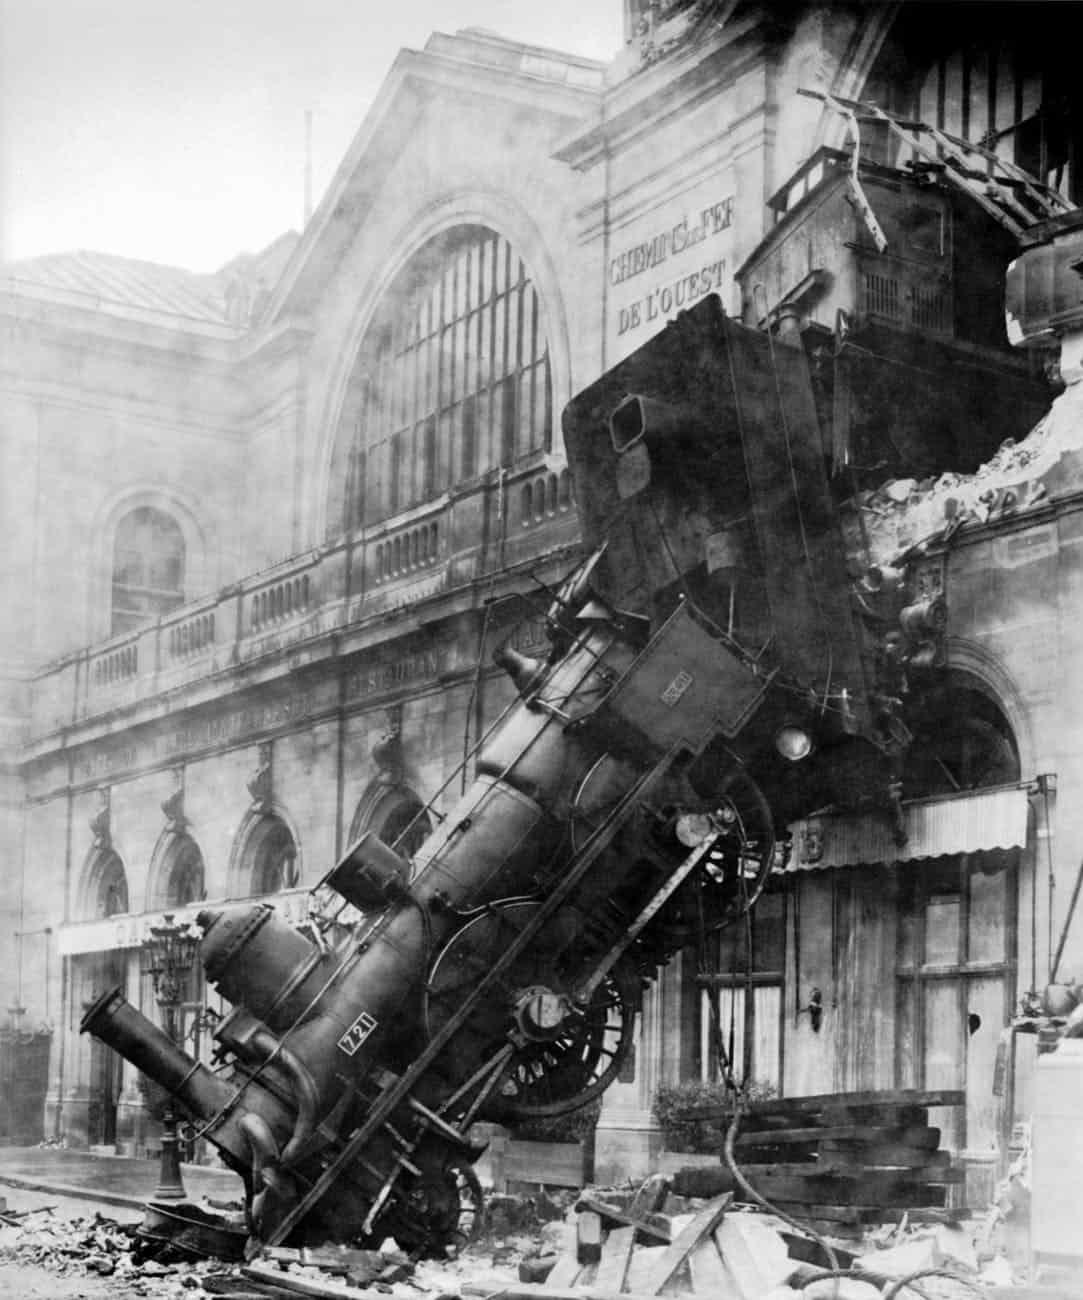 accident disaster steam locomotive train wreck